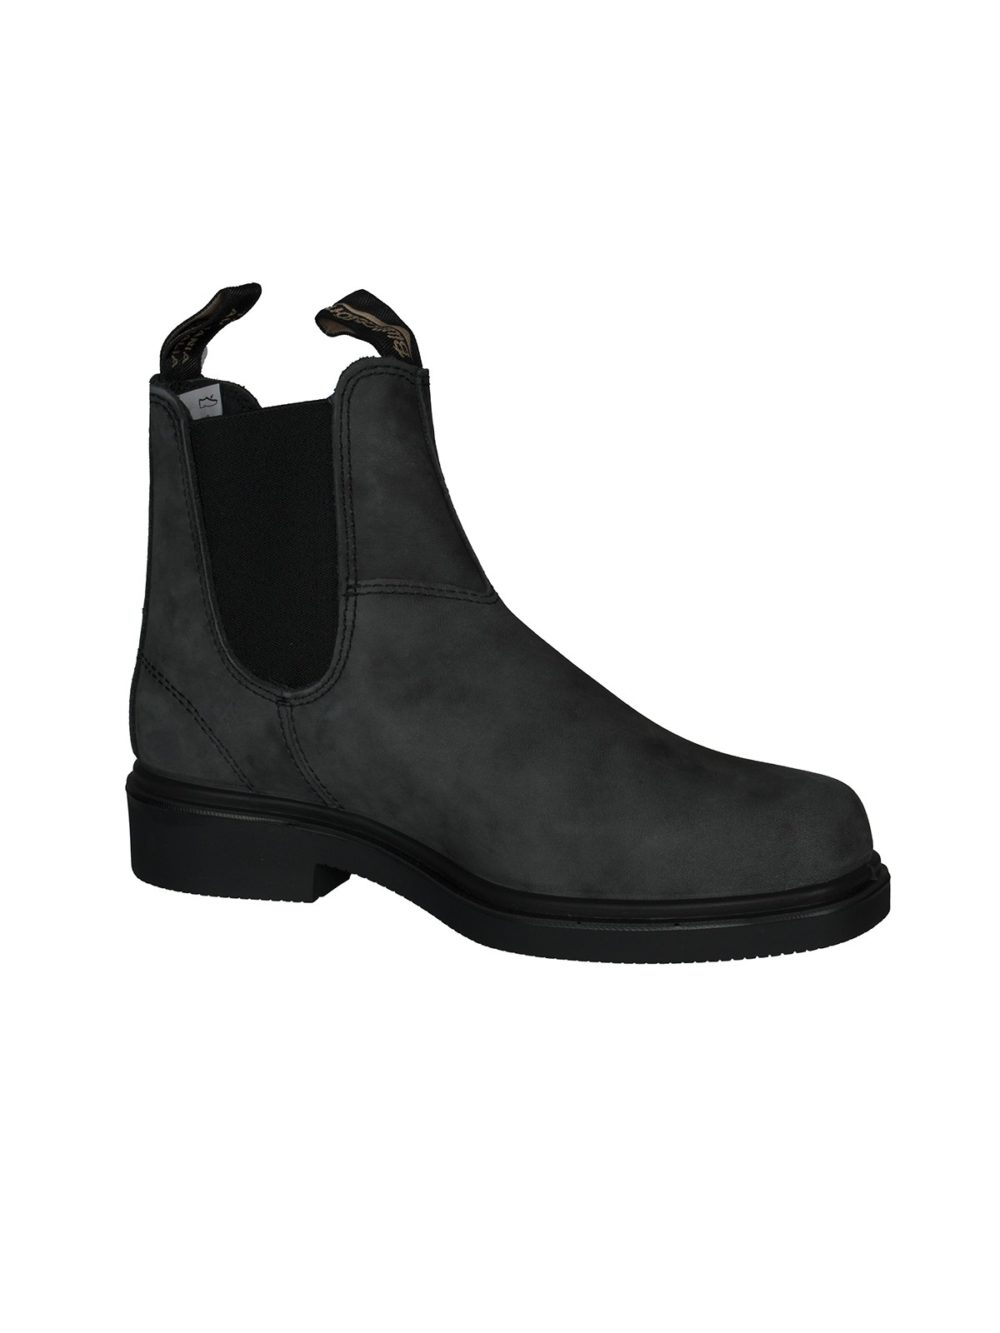 Rustic Chelsea Boot 1308